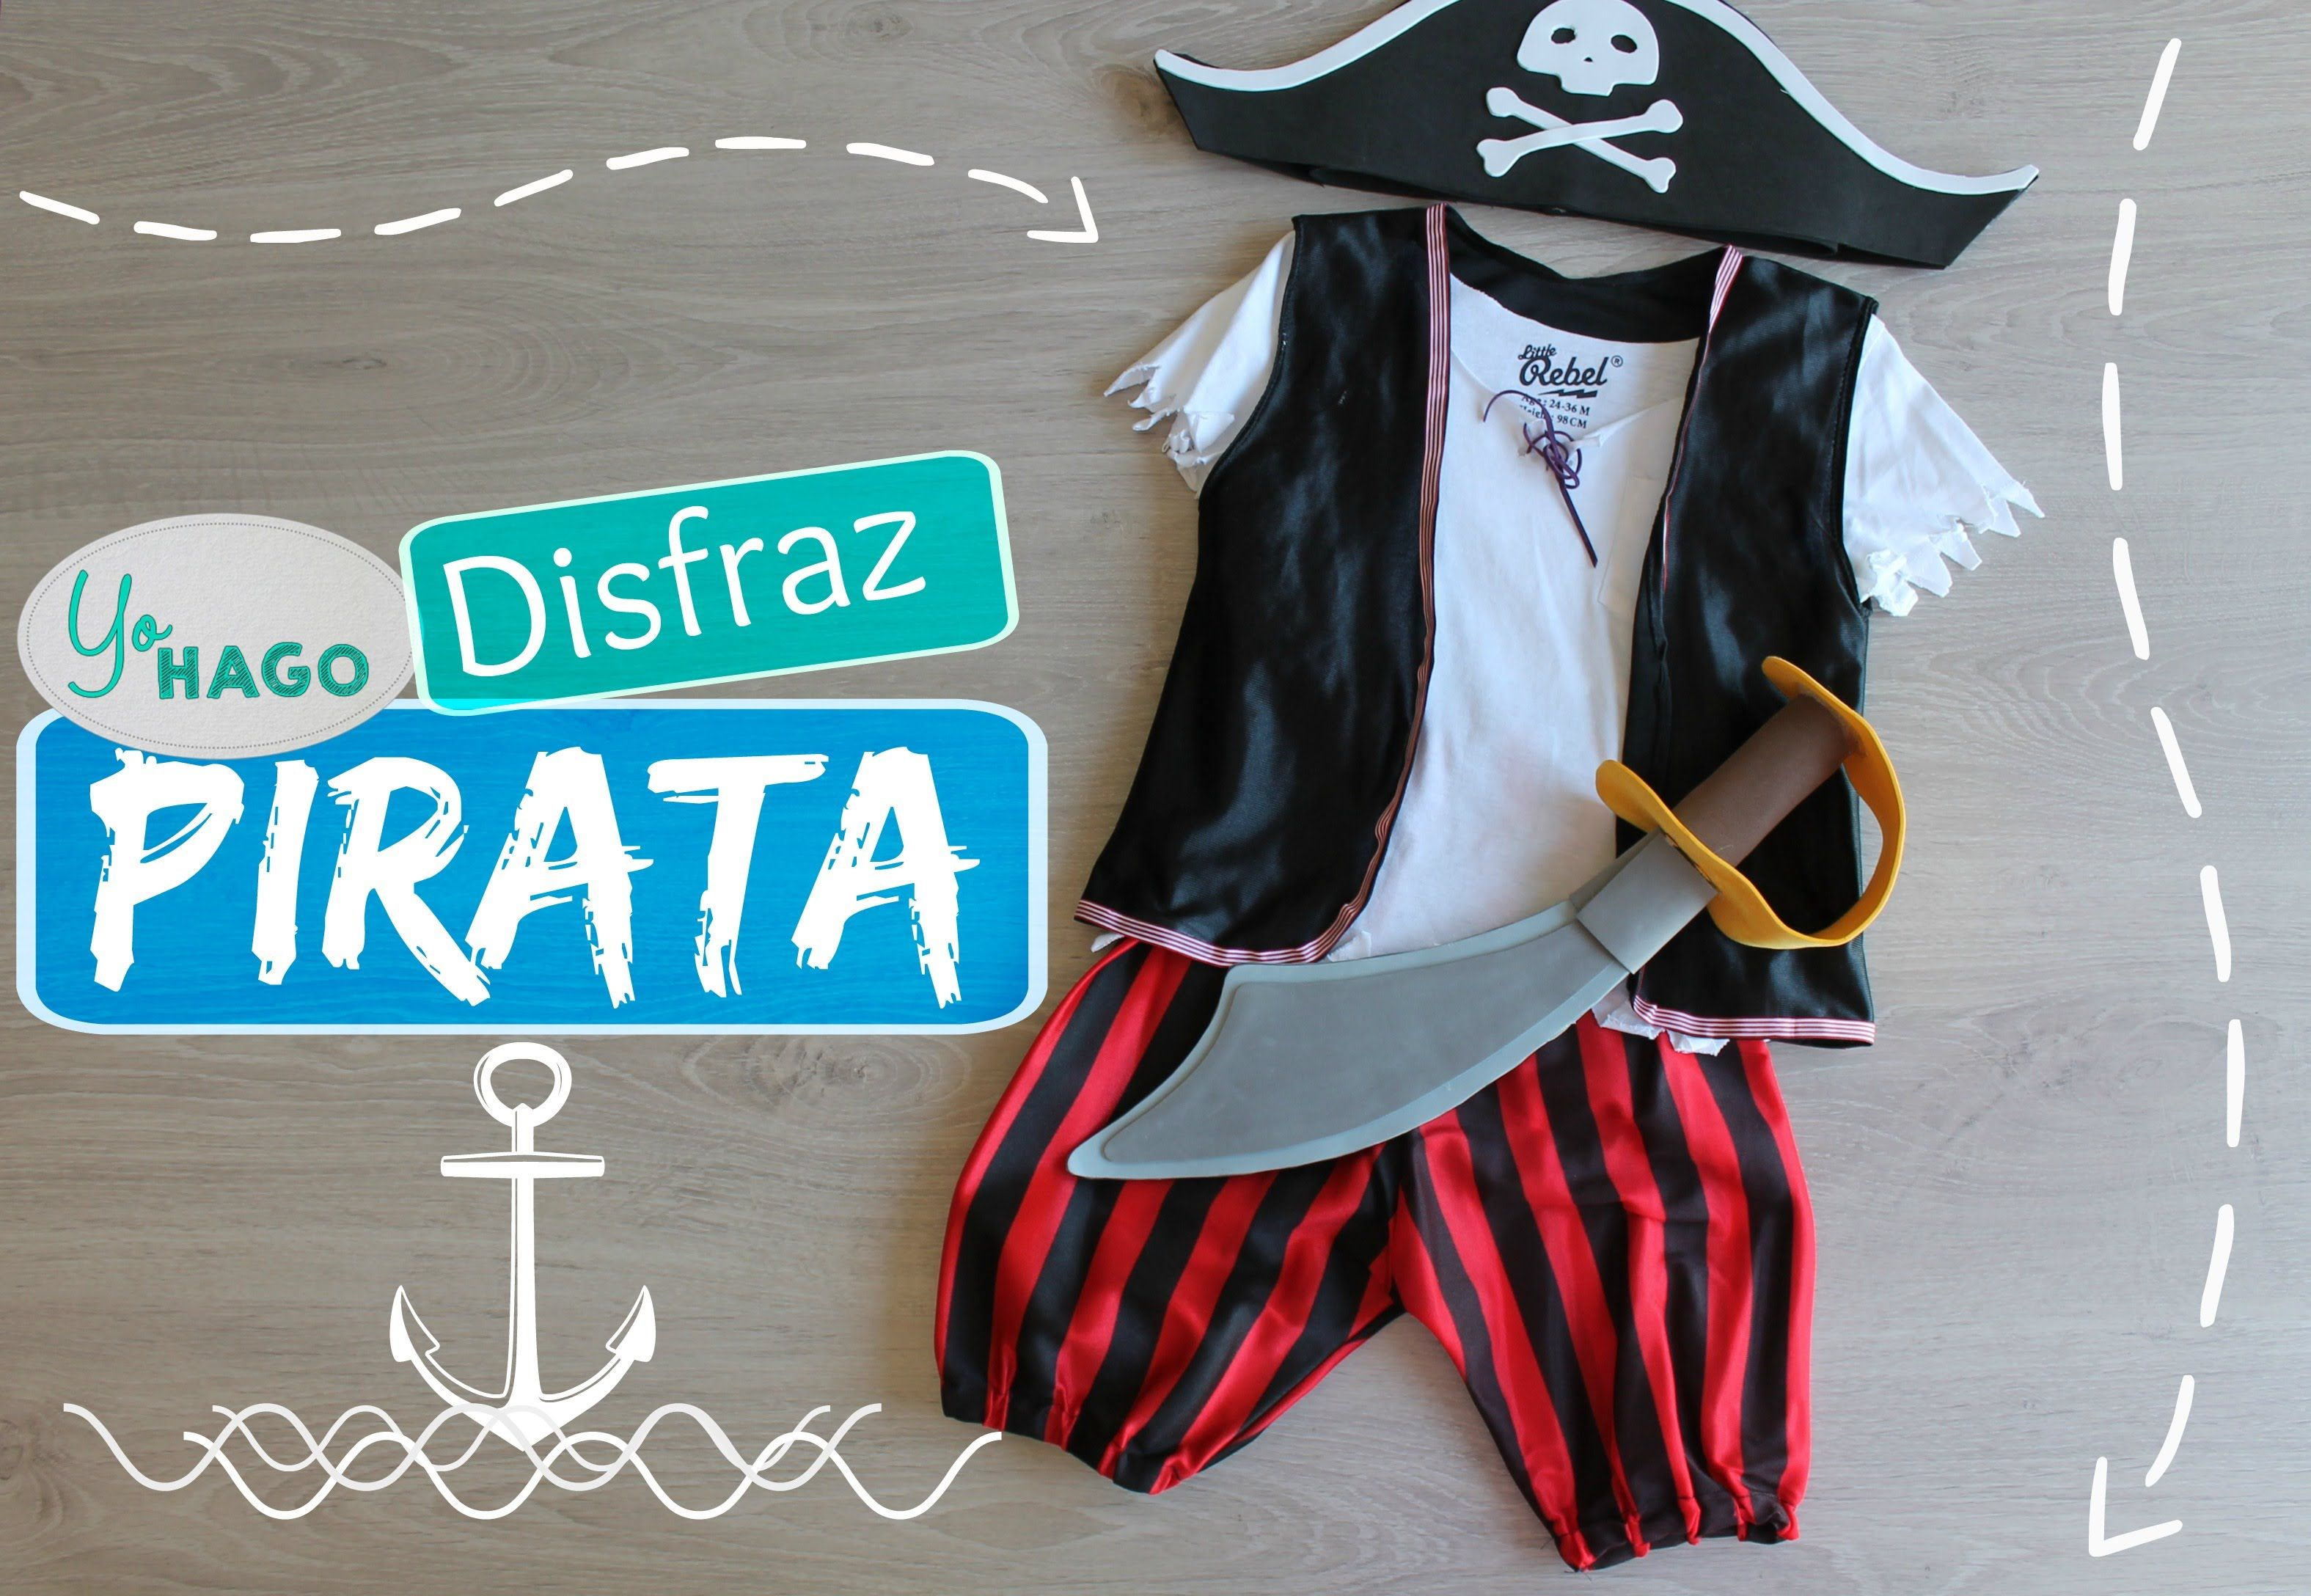 Haz un experimento paralelo Almeja maty disfraz pirata - 54o